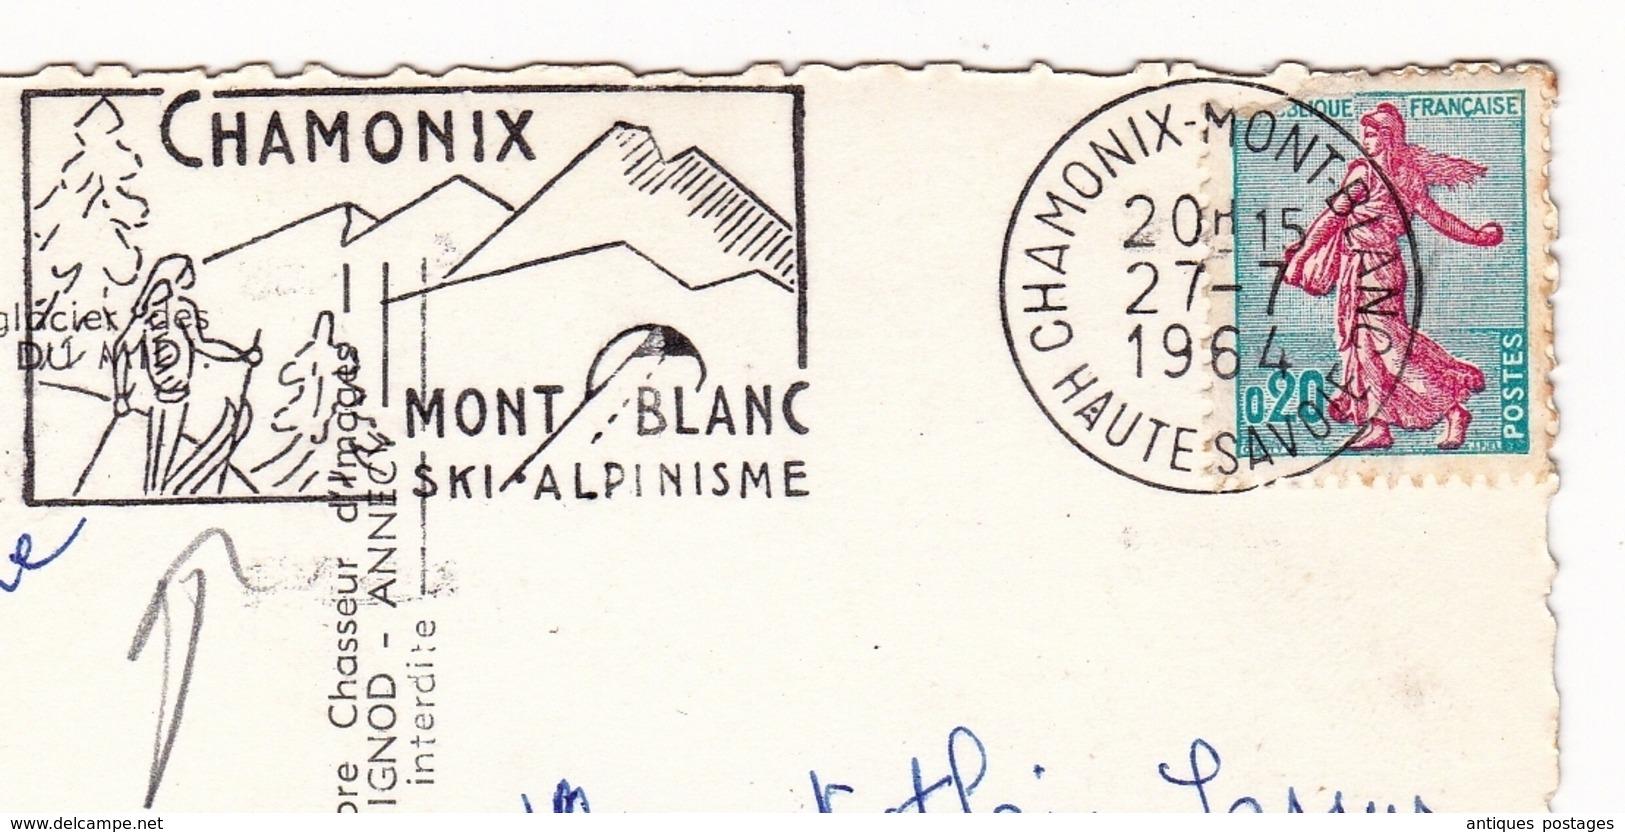 Carte Postale Aiguille Du Midi Alpes Chamonix Mont Blanc 1964 Haute Savoie Ski Alpinisme - Frankrijk